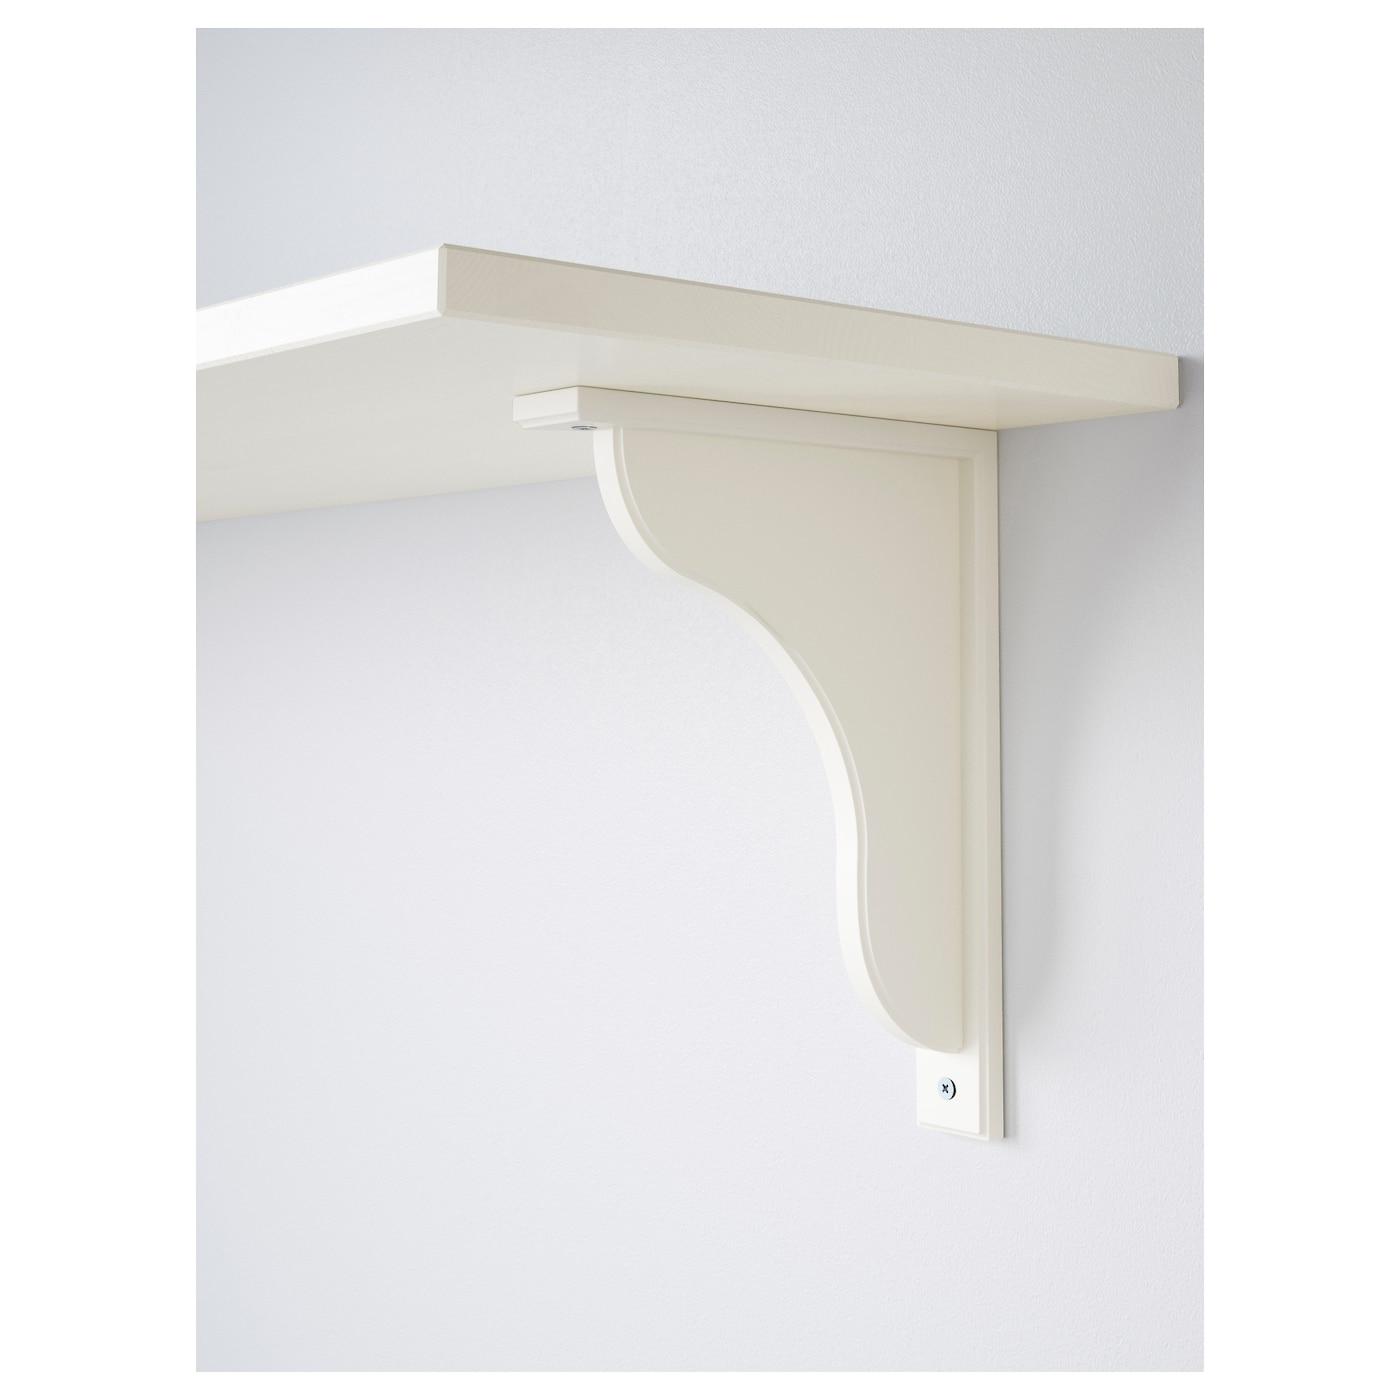 EKBY HENSVIK EKBY HEMNES Wall shelf White stain white 119x28 cm IKEA